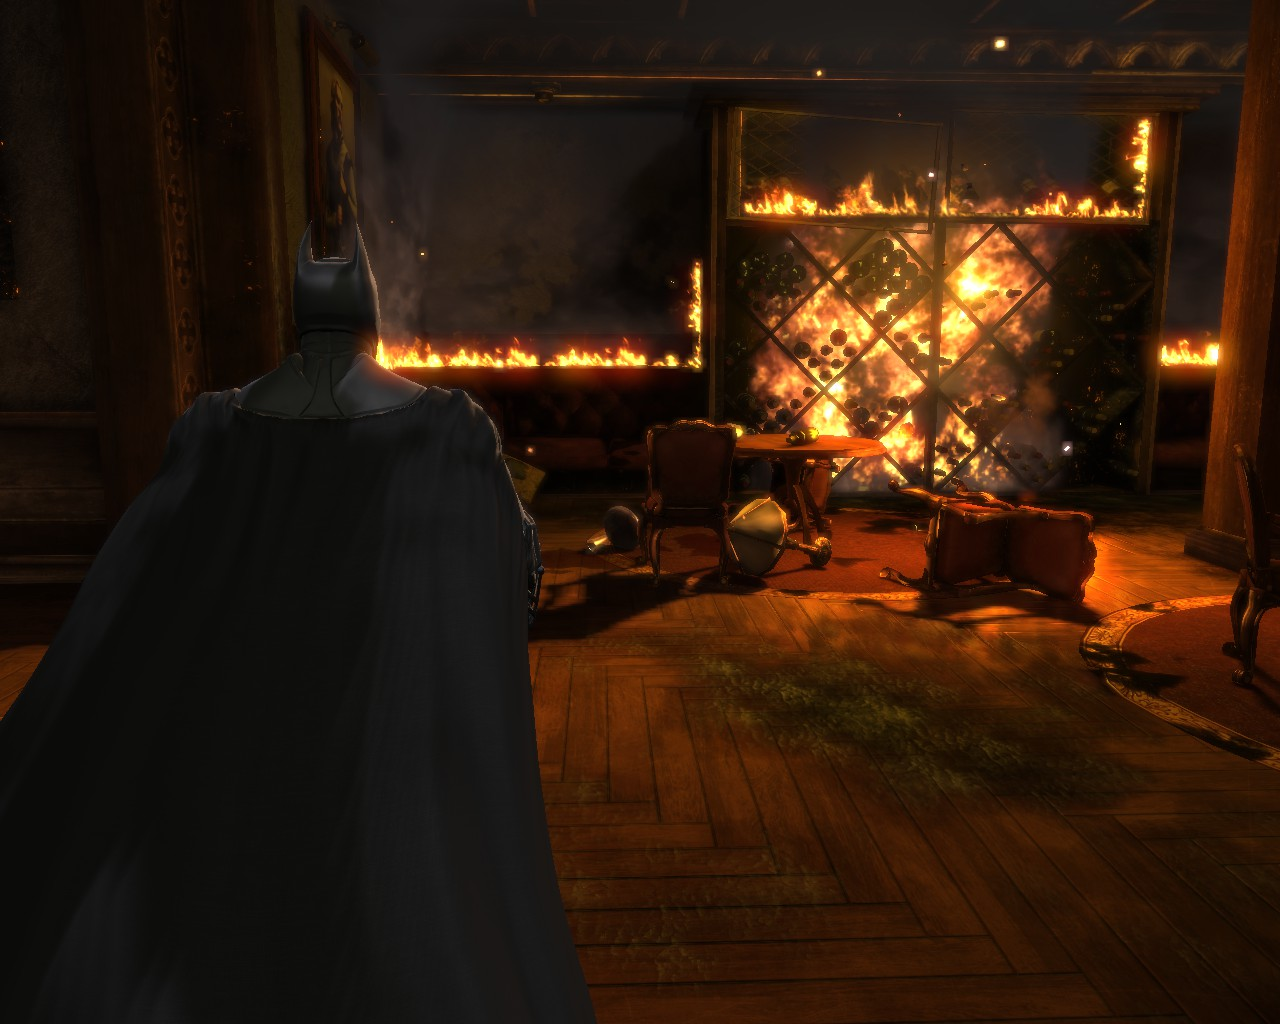 BatmanOrigins 2014-07-09 23-06-57-23.jpg - Batman: Arkham Origins